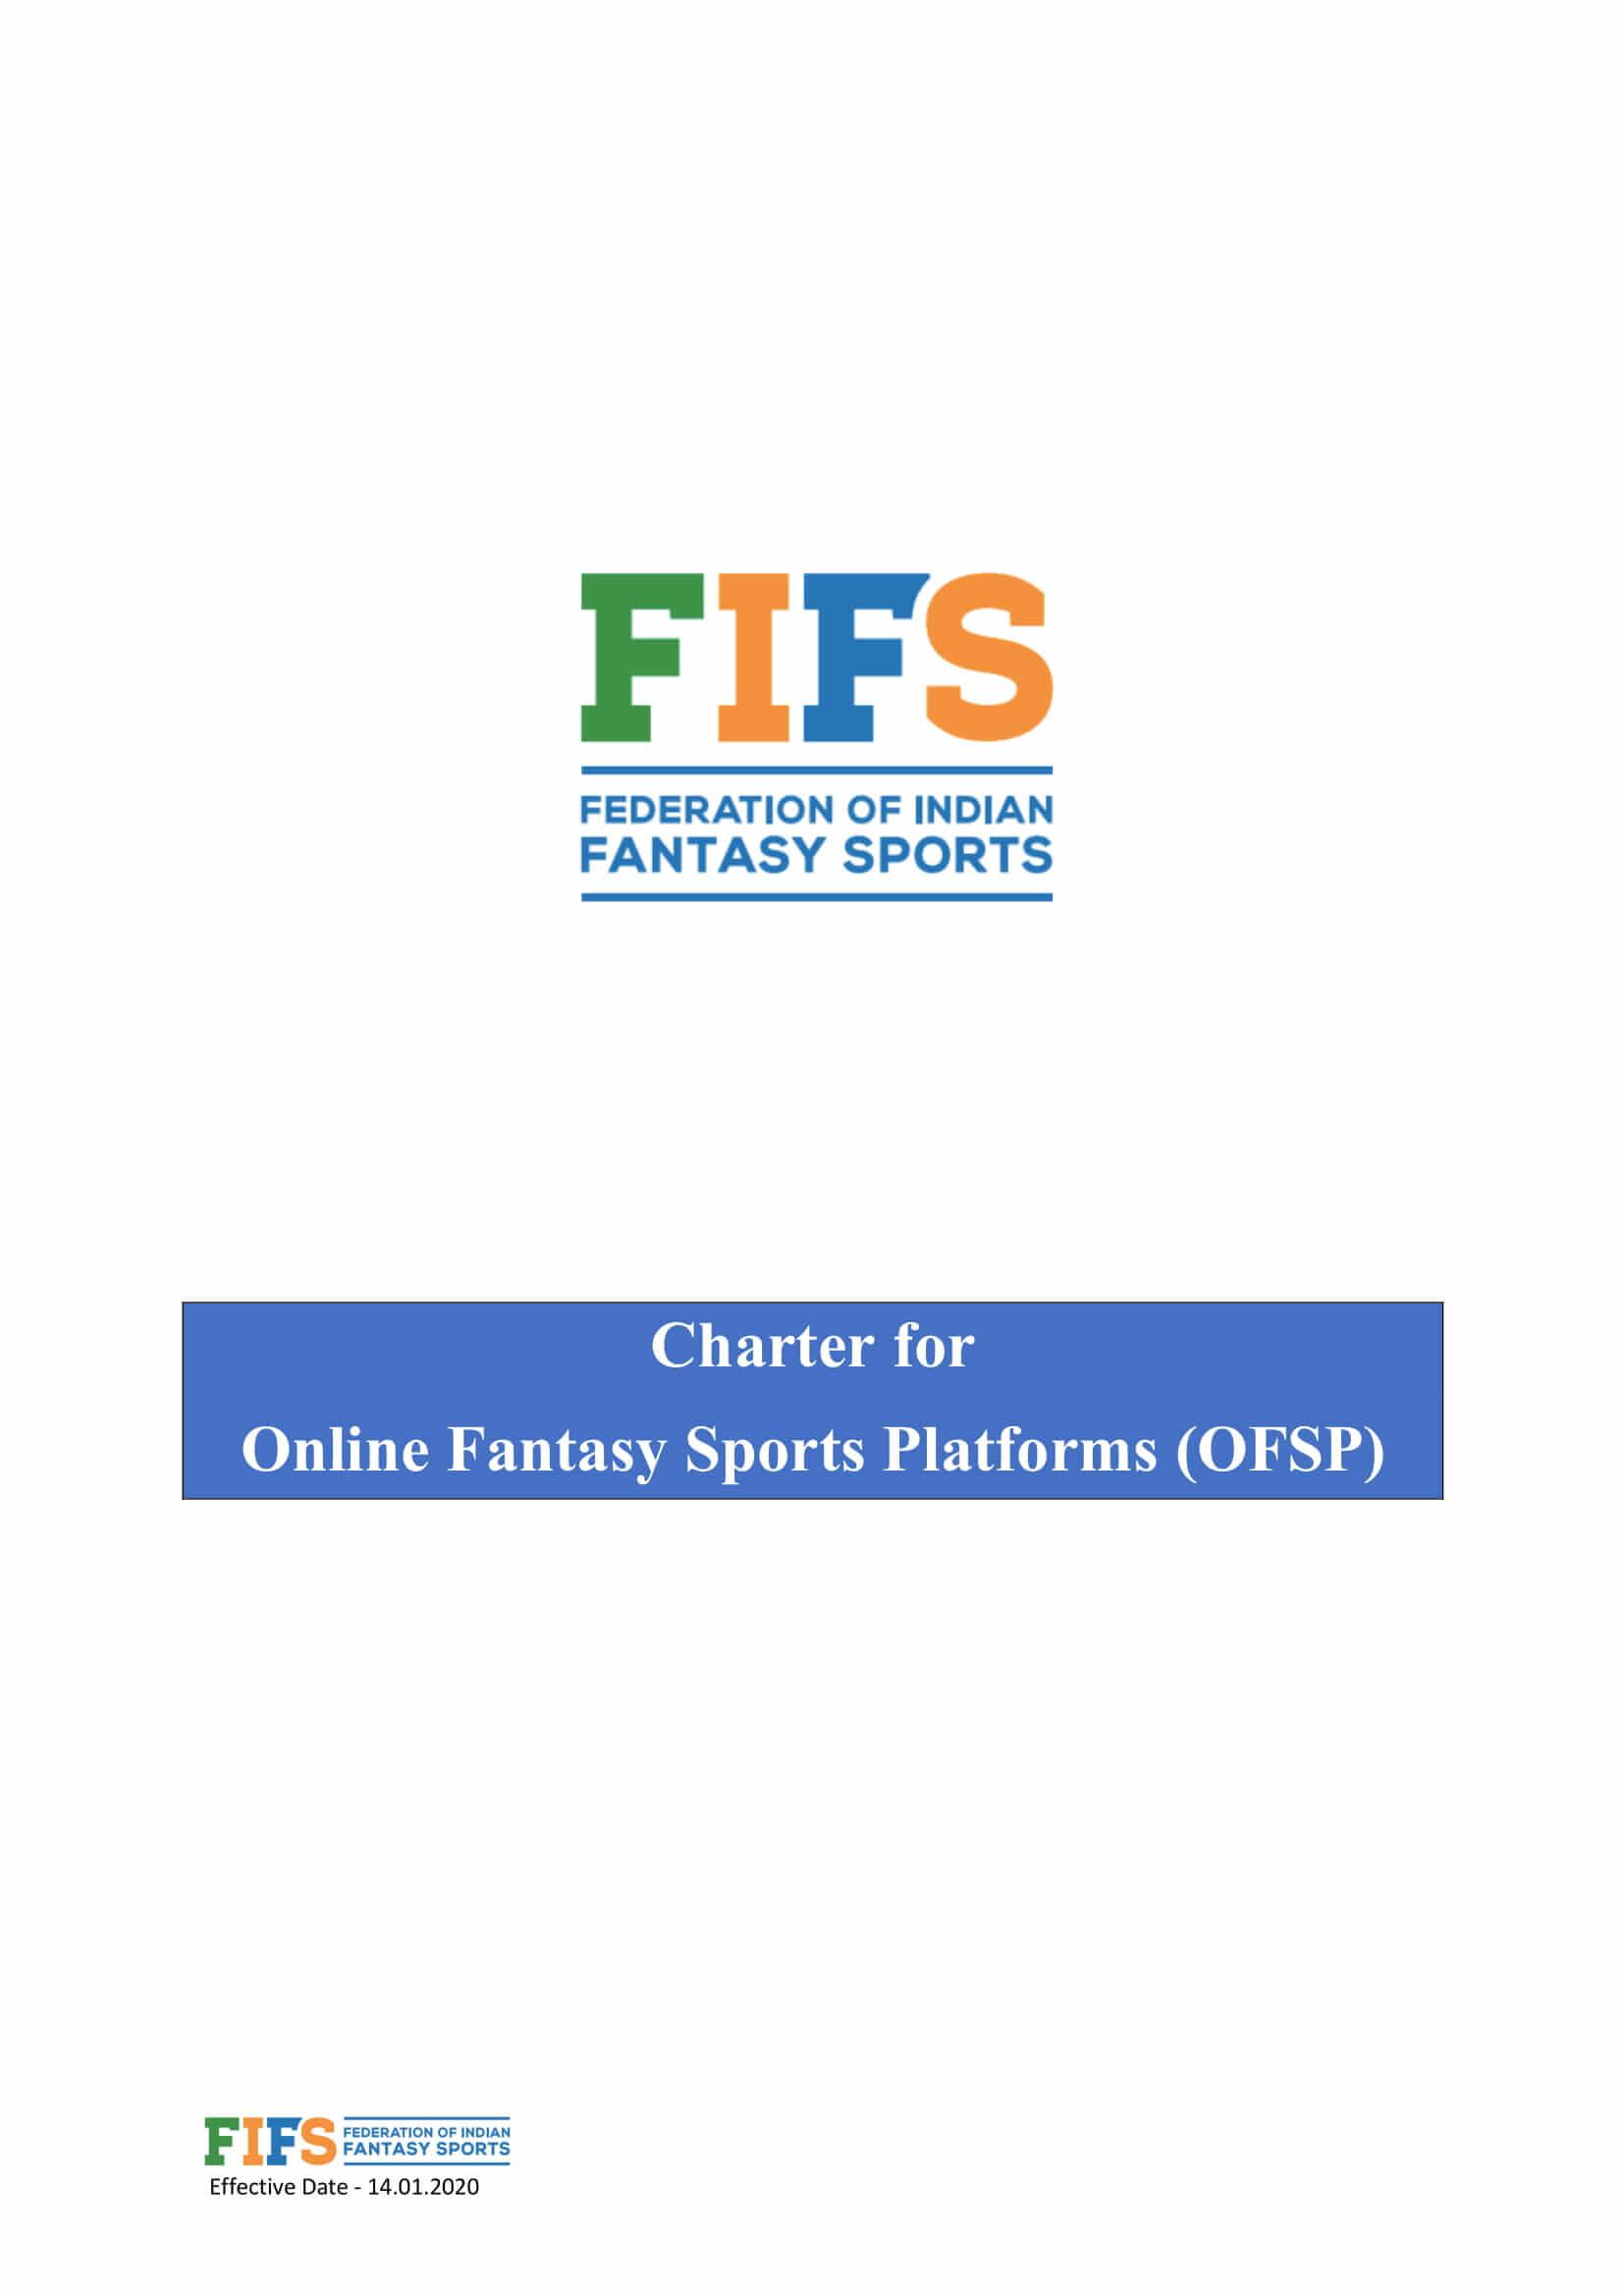 FIFS Charter page 1